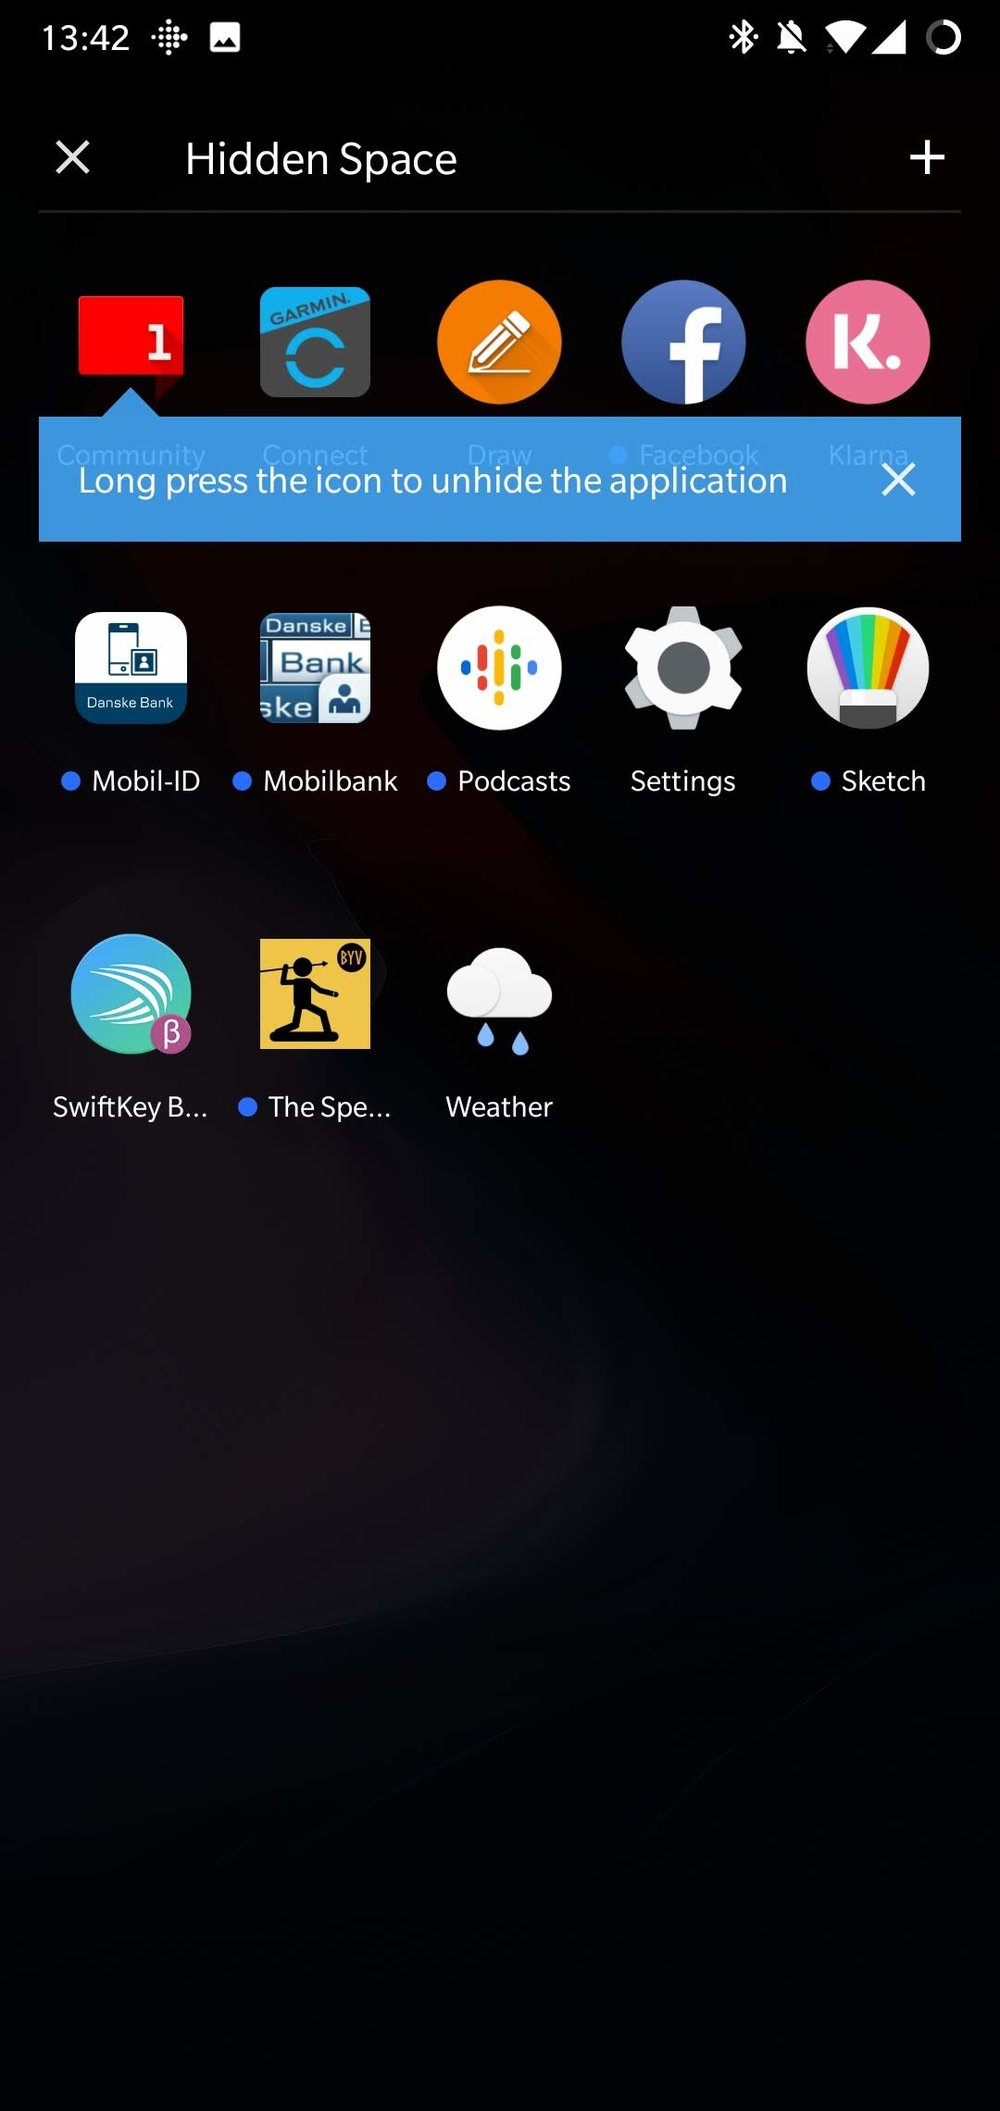 App-Drawer, Hidden Space